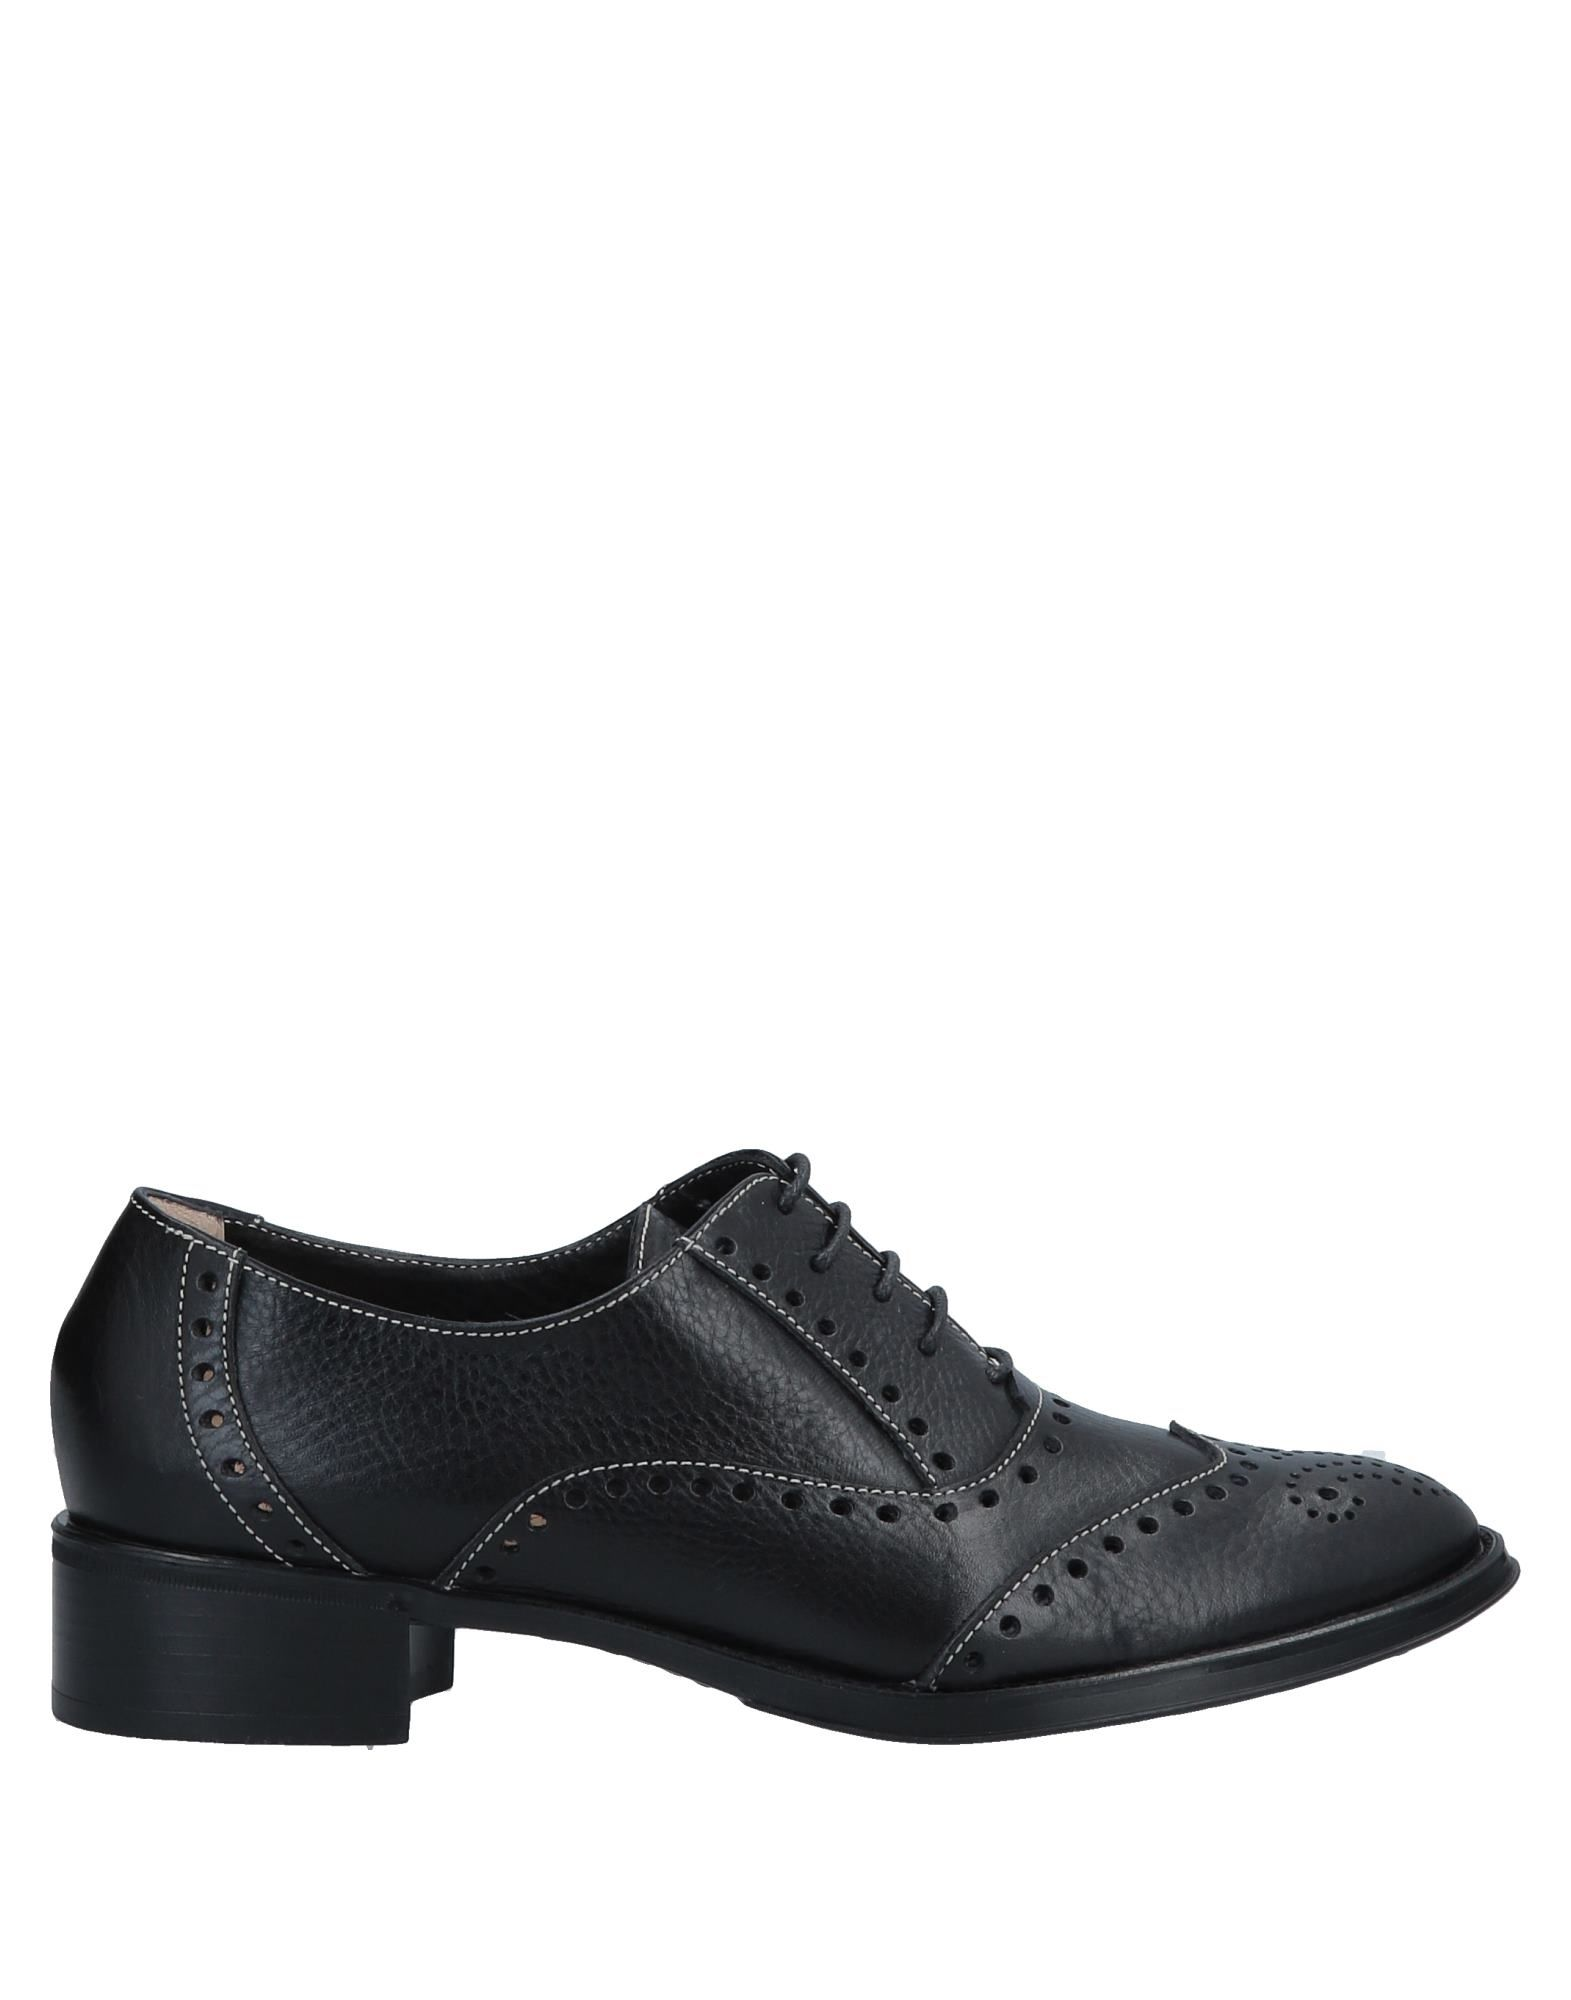 F.LLI BRUGLIA Обувь на шнурках обувь 2015 тренды